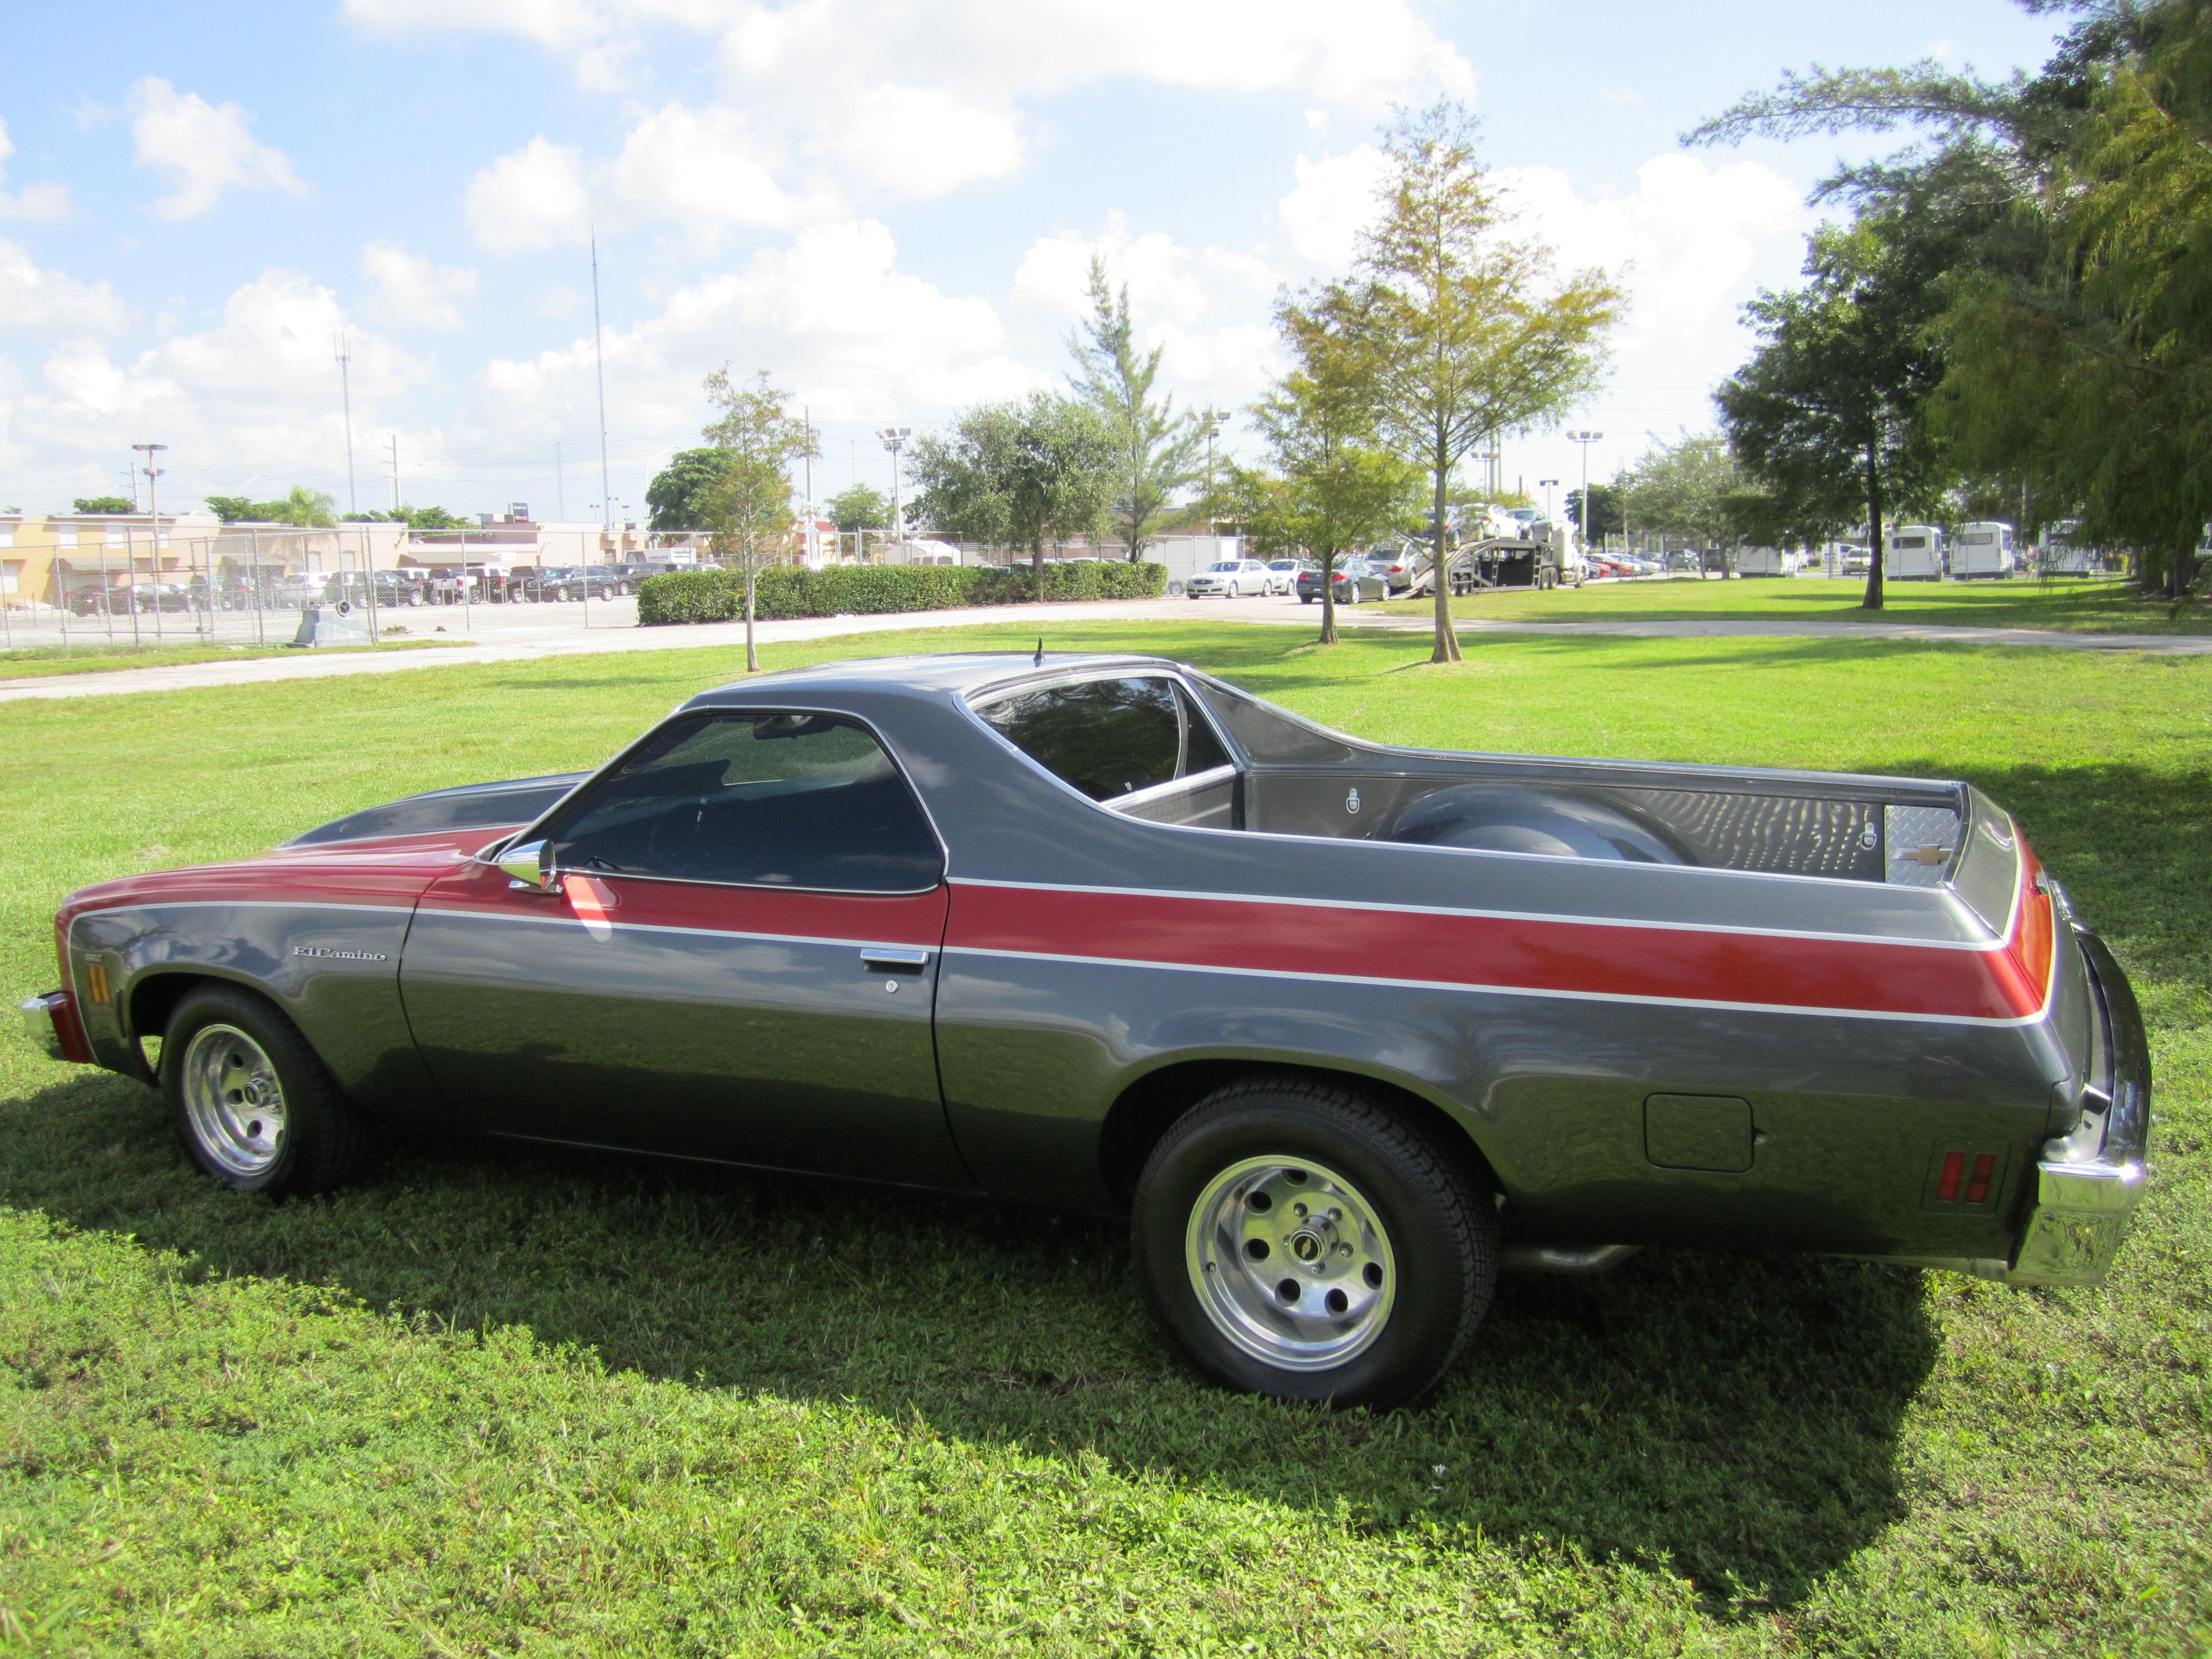 1973 El Camino 1973 Chevrolet El Camino Chevrolet El Camino